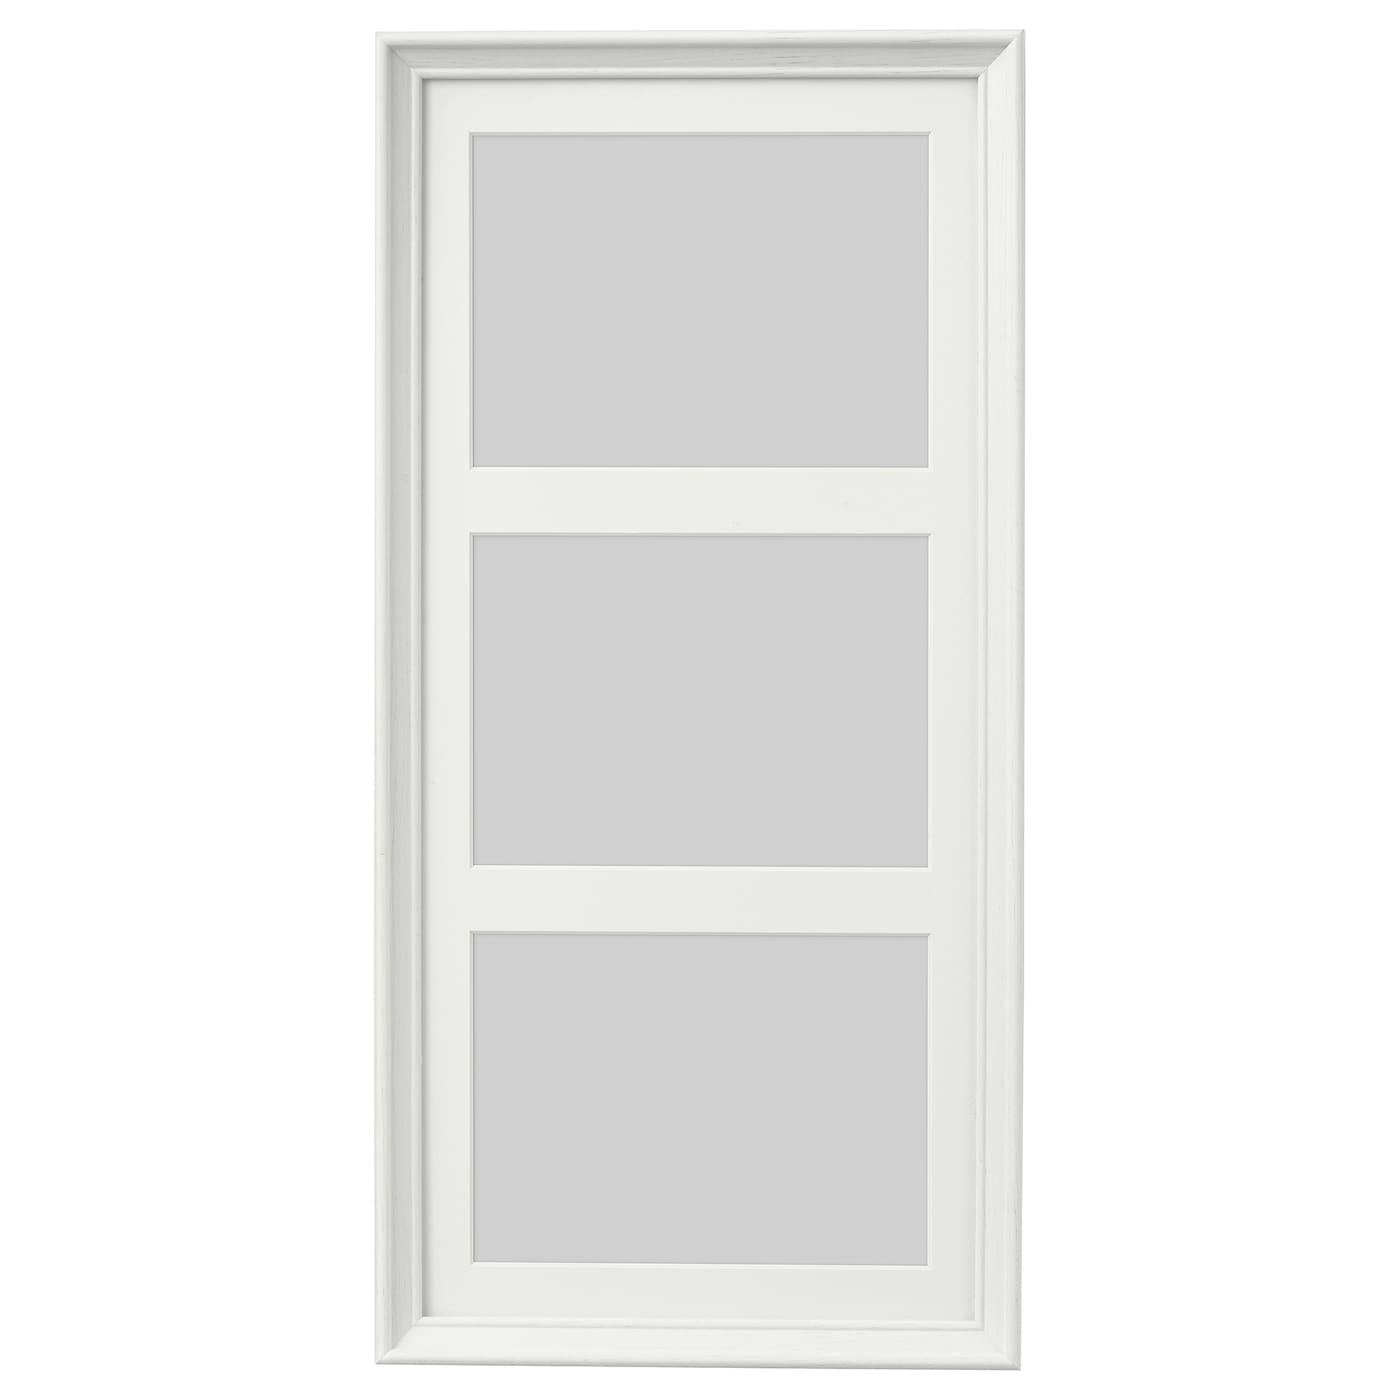 knopp ng cadre pour 3 photos teint blanc 50 x 23 cm ikea. Black Bedroom Furniture Sets. Home Design Ideas